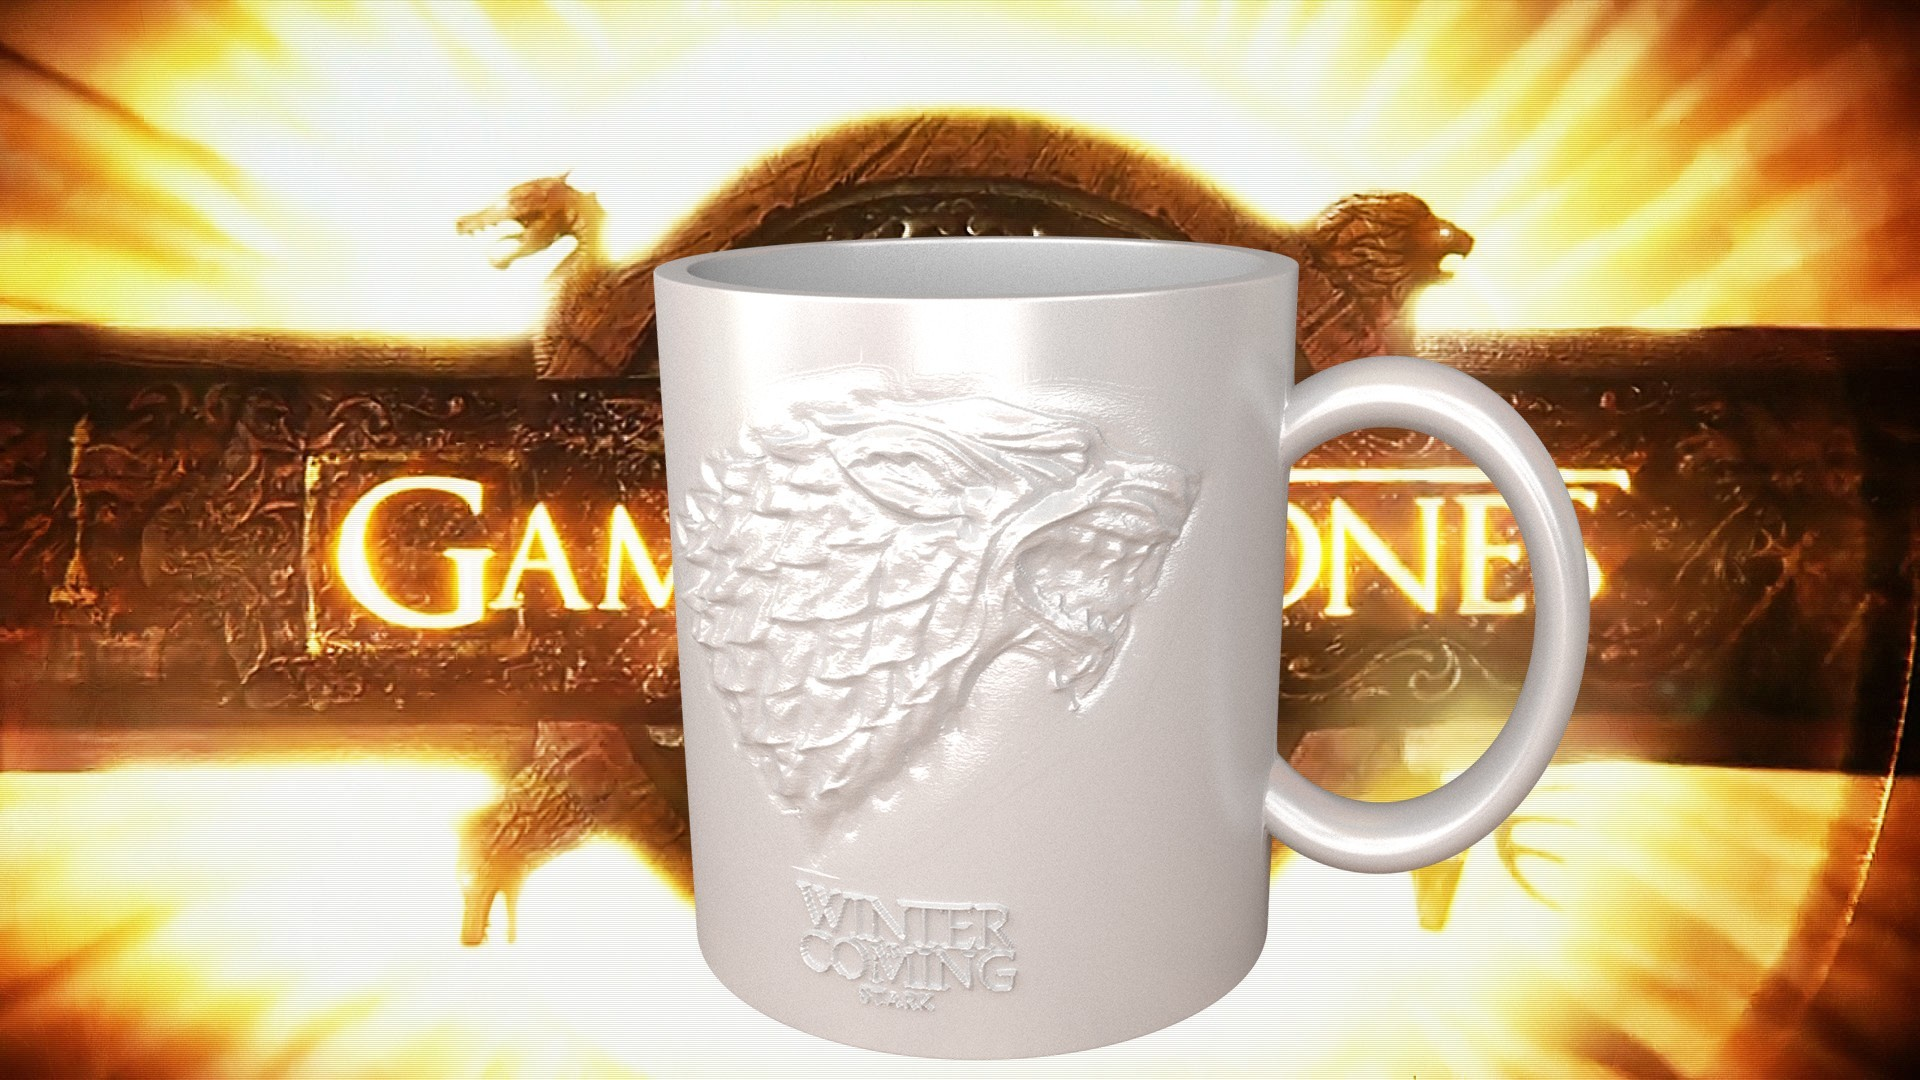 1.1.jpg Download STL file Game Of Thrones Stark Coffee Mug • 3D printer object, SimaDesign